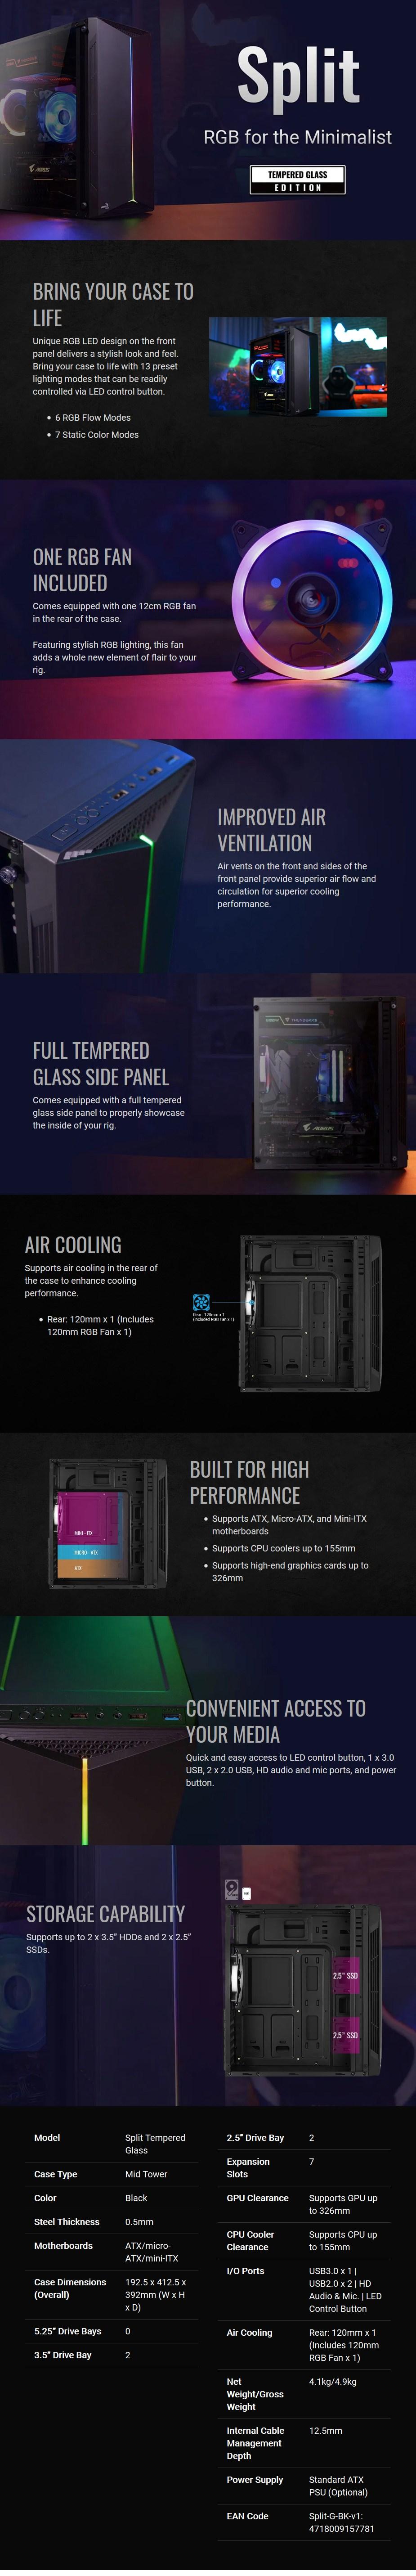 aerocool-split-tempered-glass-rgb-atx-midtower-case-black-ac35501-1.jpg